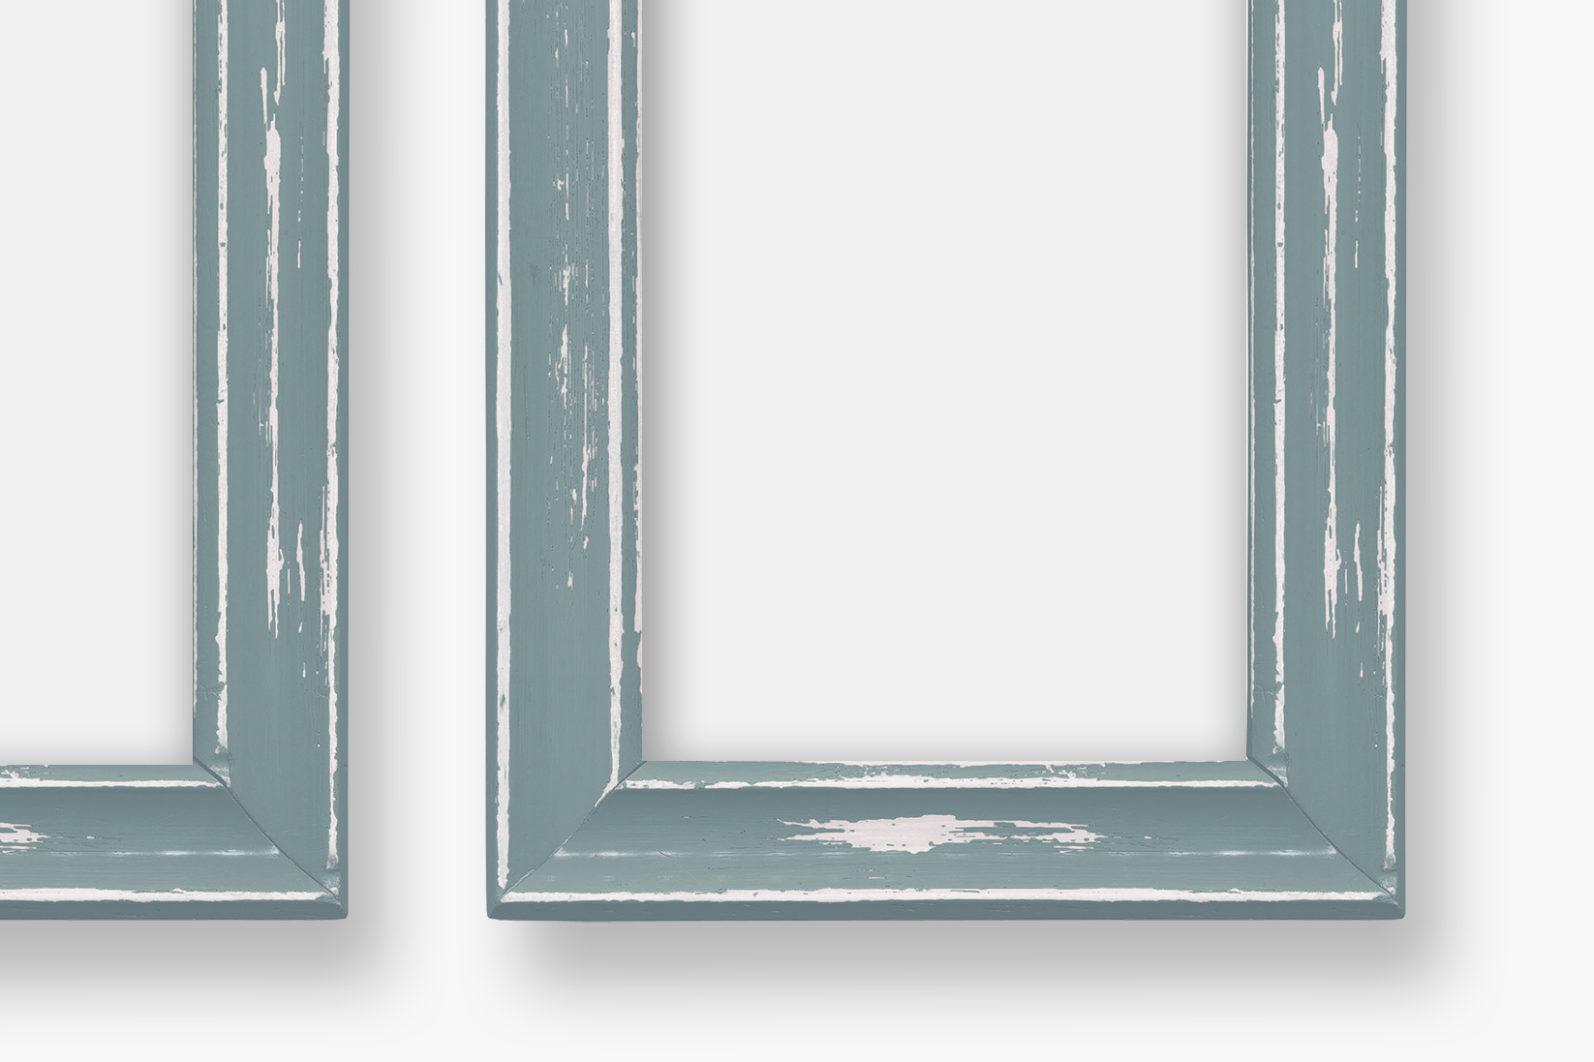 Frame Mockup, Blue Wood Portrait Photo Frame, Two Frame Mockup, PSD - Wood Series 1 Preview 5 -